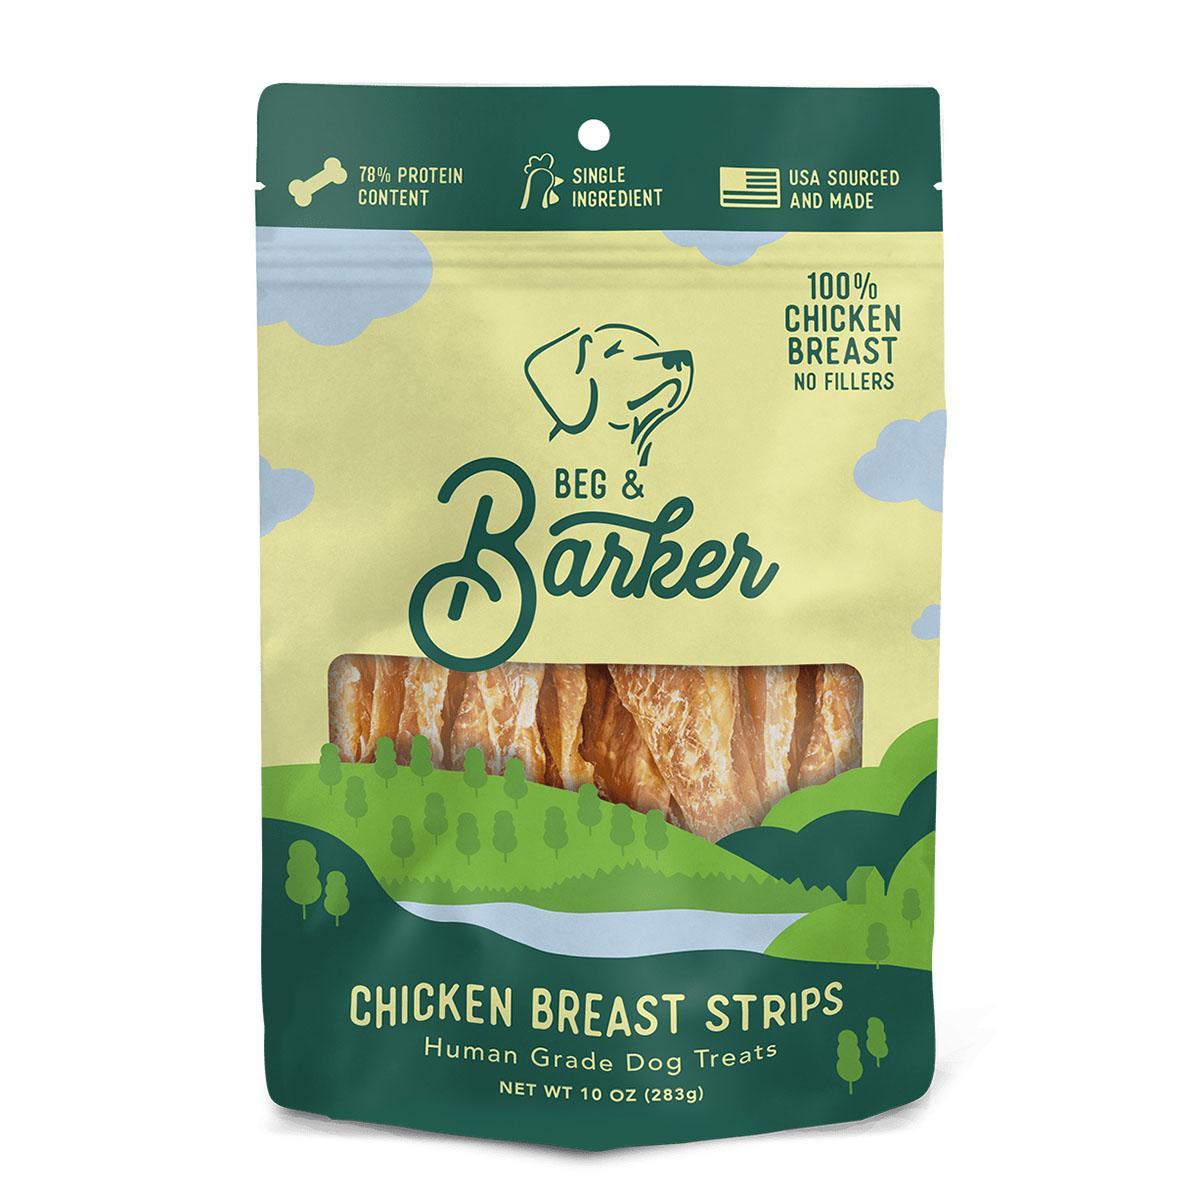 Beg & Barker Chicken Breast Strips Dog Treats